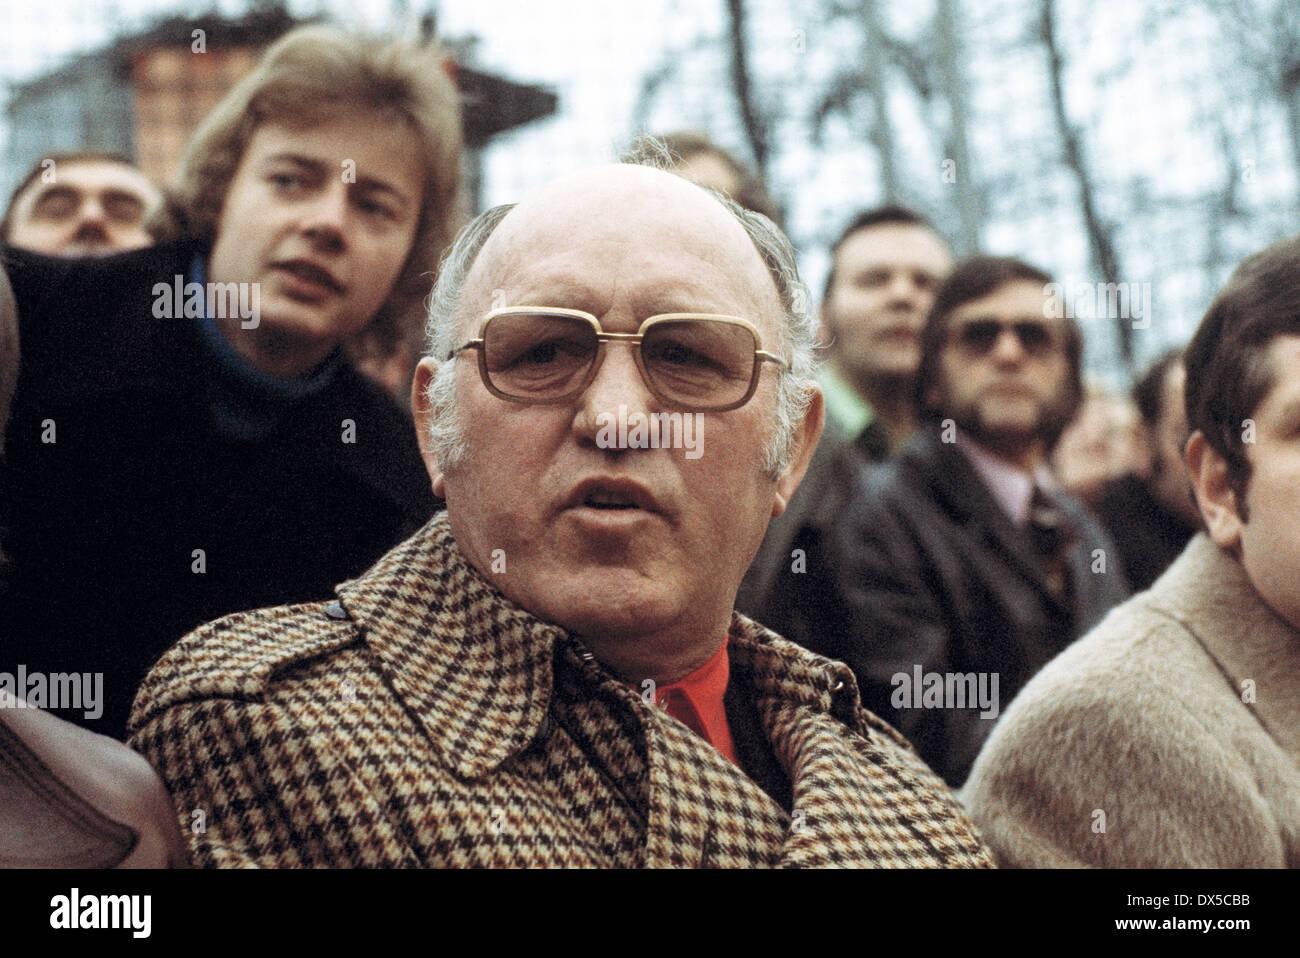 football, 2. Bundesliga Nord, 1974/1975, Stimberg Stadium in Oer-Erkenschwick, SpVgg Erkenschwick versus Hanover 96 0:1, coach Helmut Kronsbein (96) on the coaching bench - Stock Image